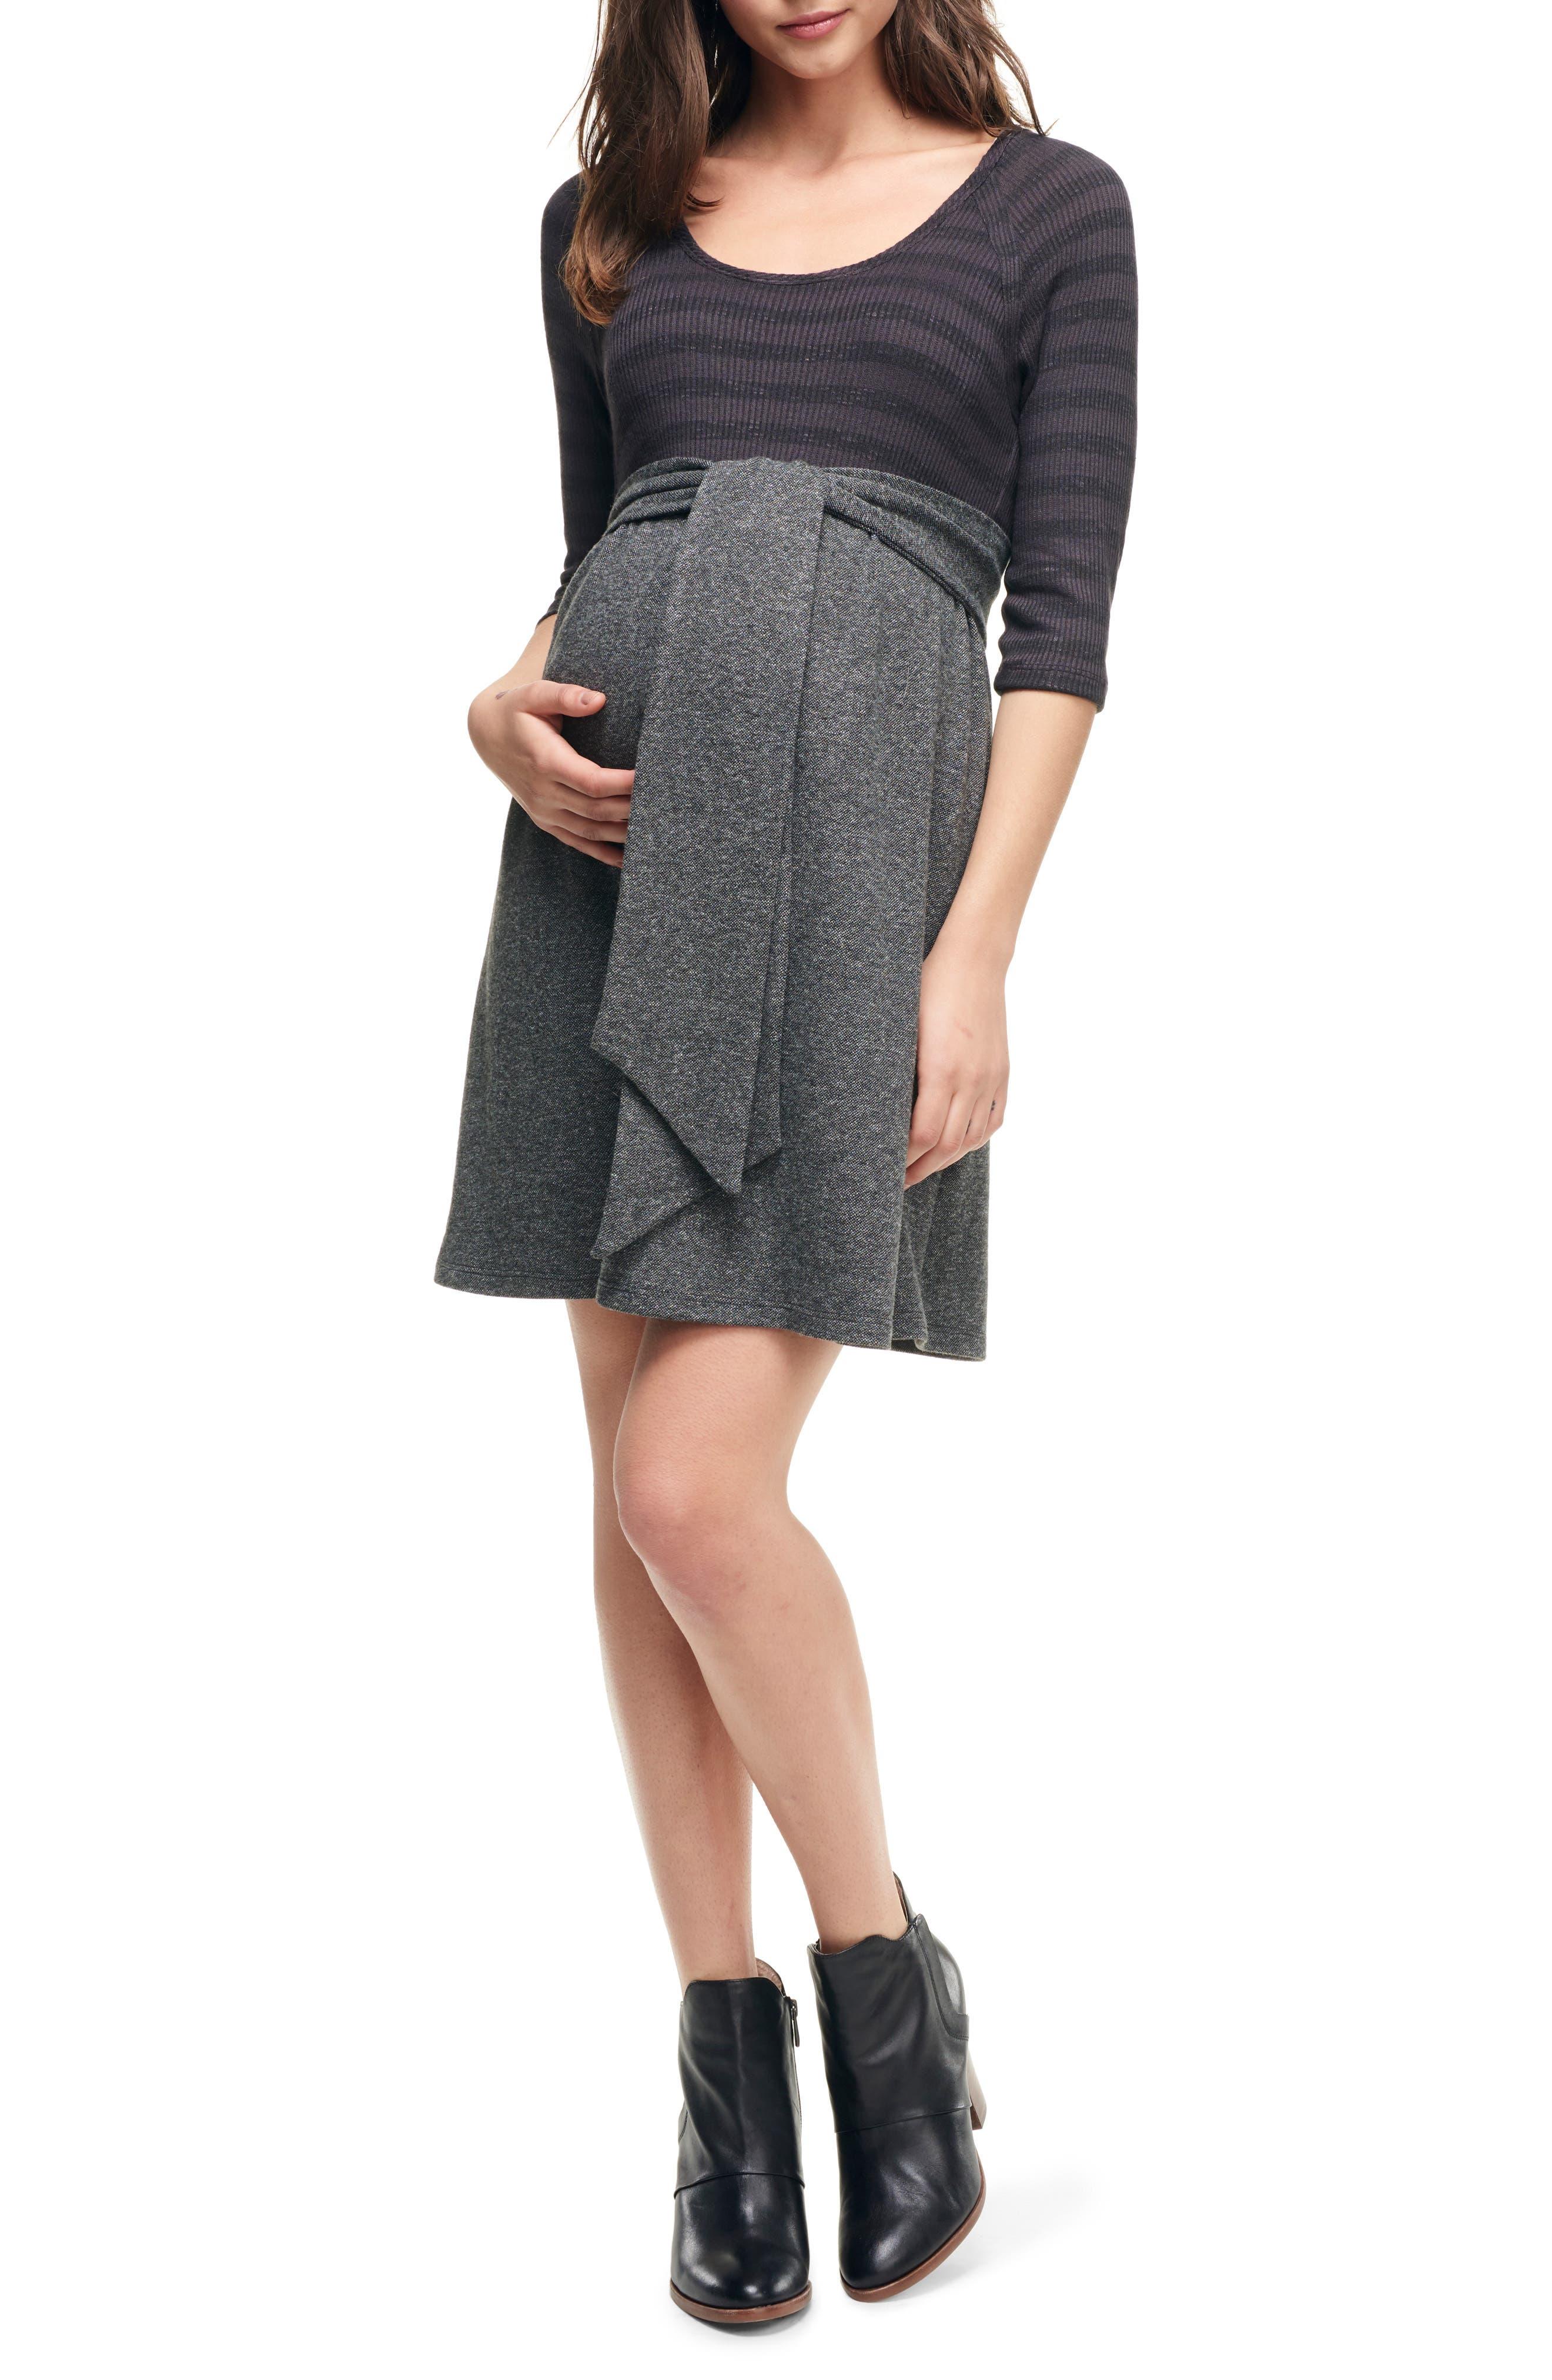 Maternal America Scoop Neck Maternity Dress, Black